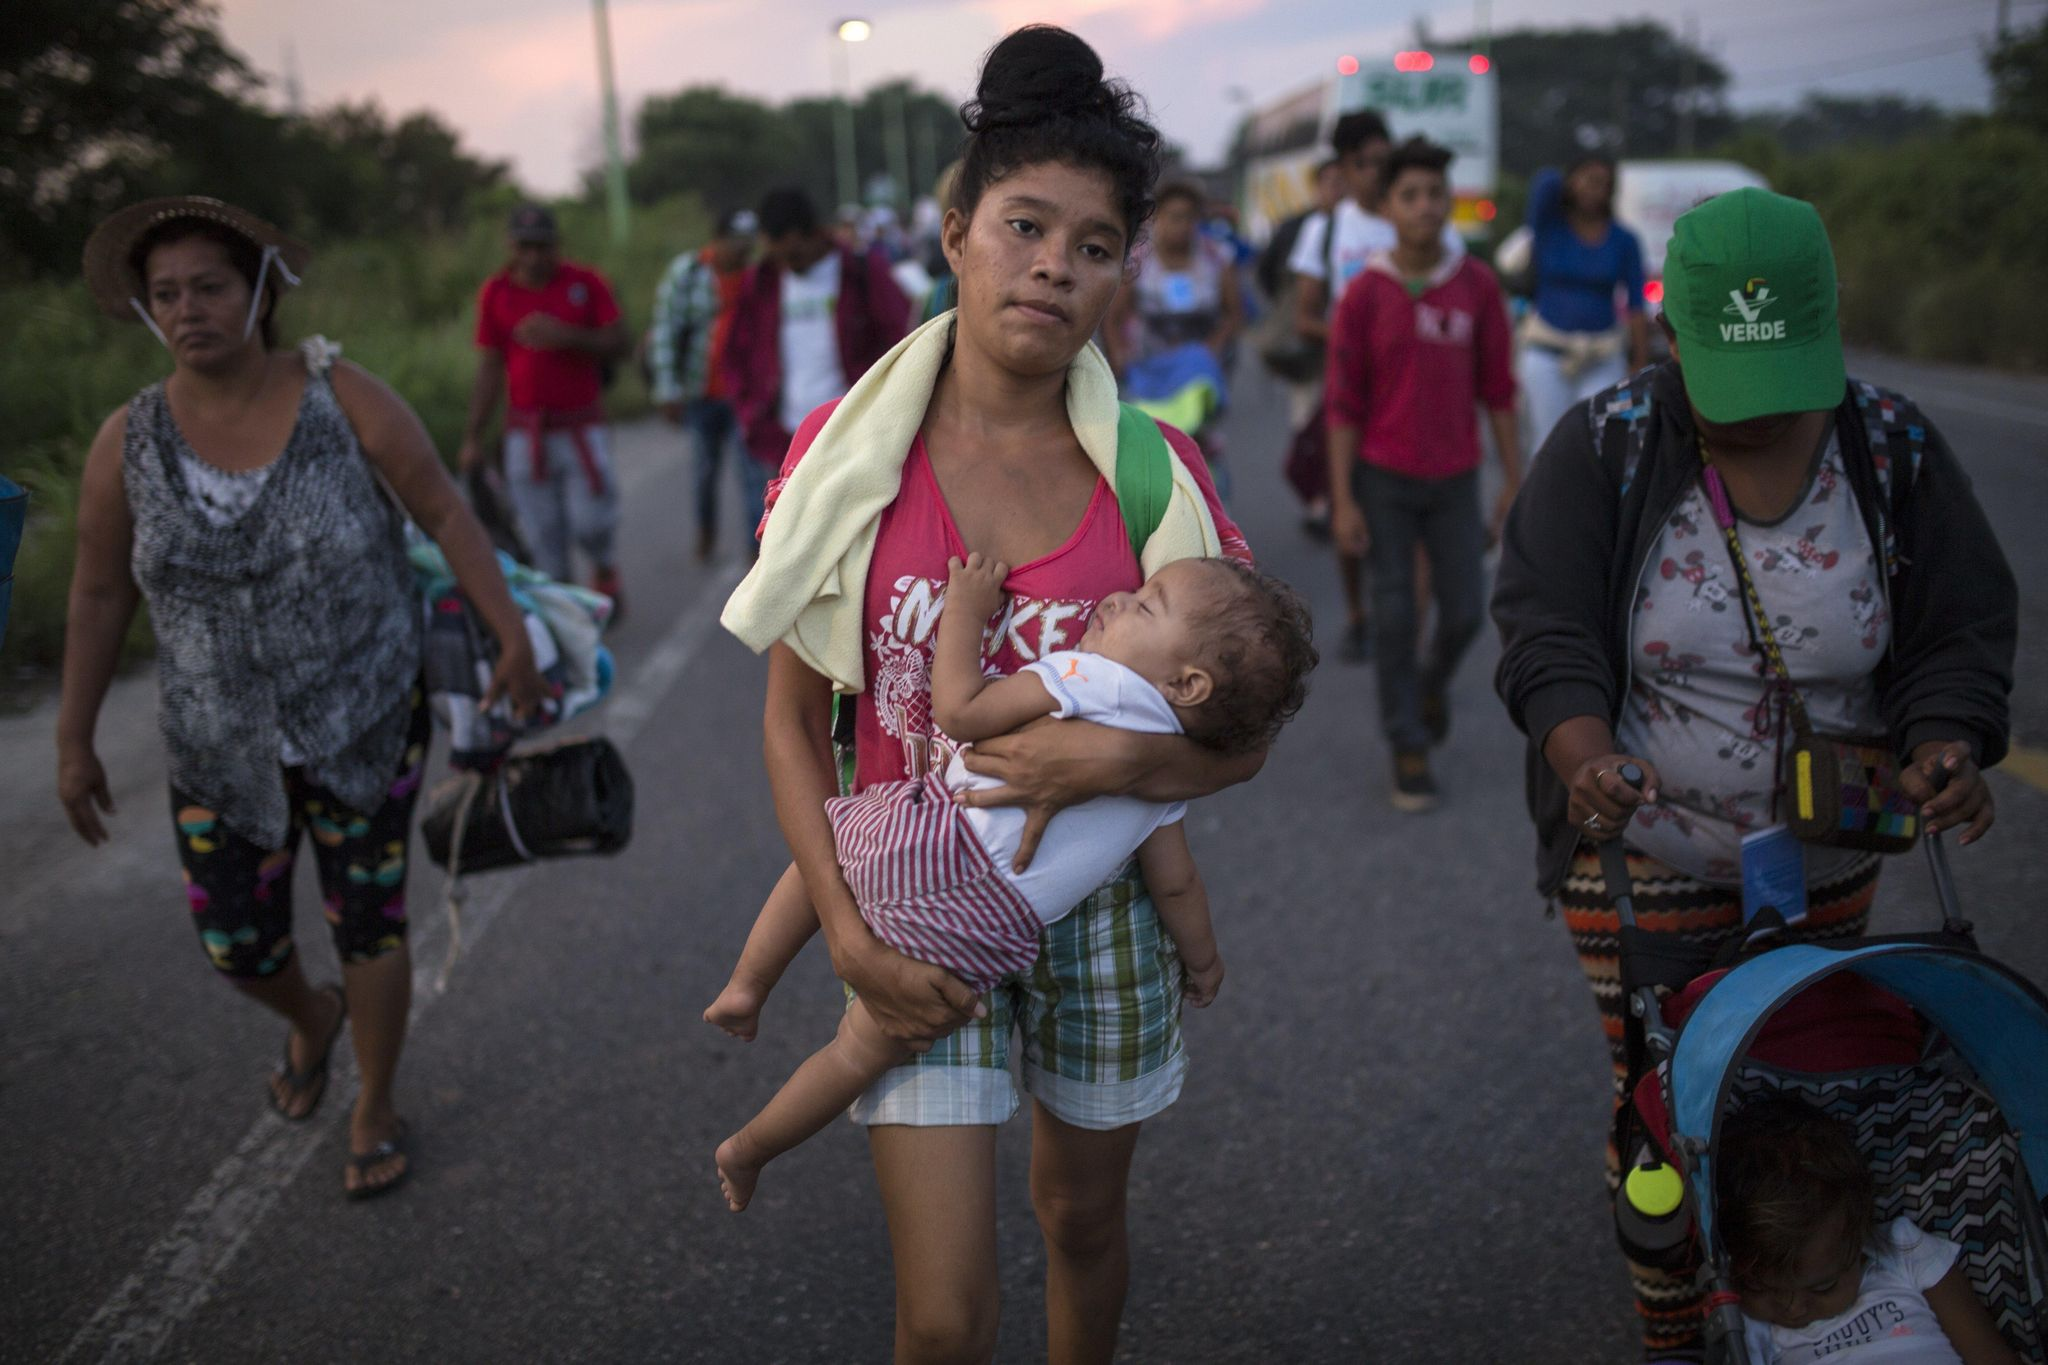 Third migrant caravan enters Mexico, heads for U.S. border